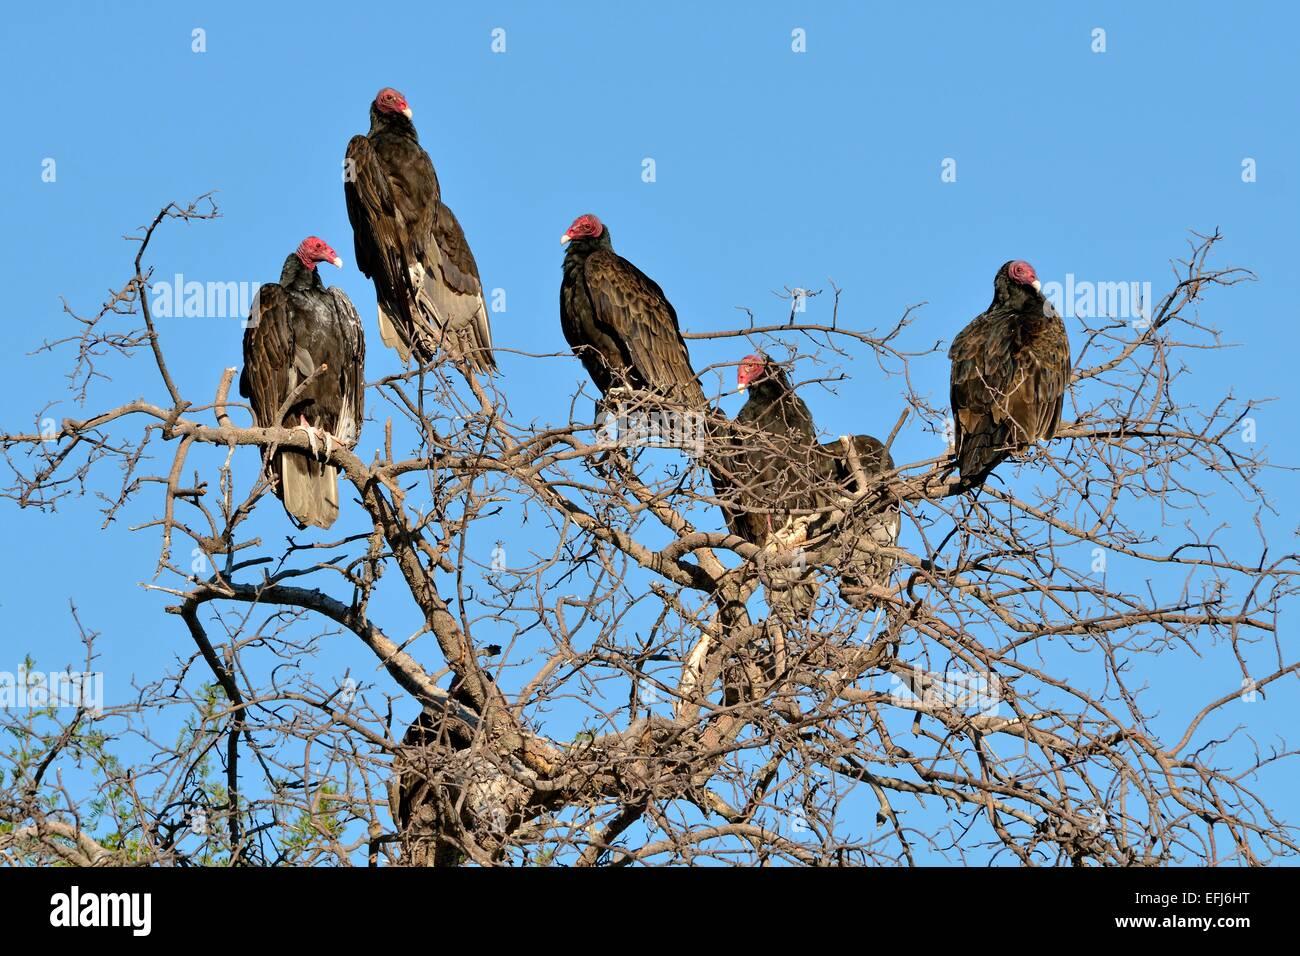 Turkey Vultures (Cathartes aura), Baja California Sur, Mexico - Stock Image